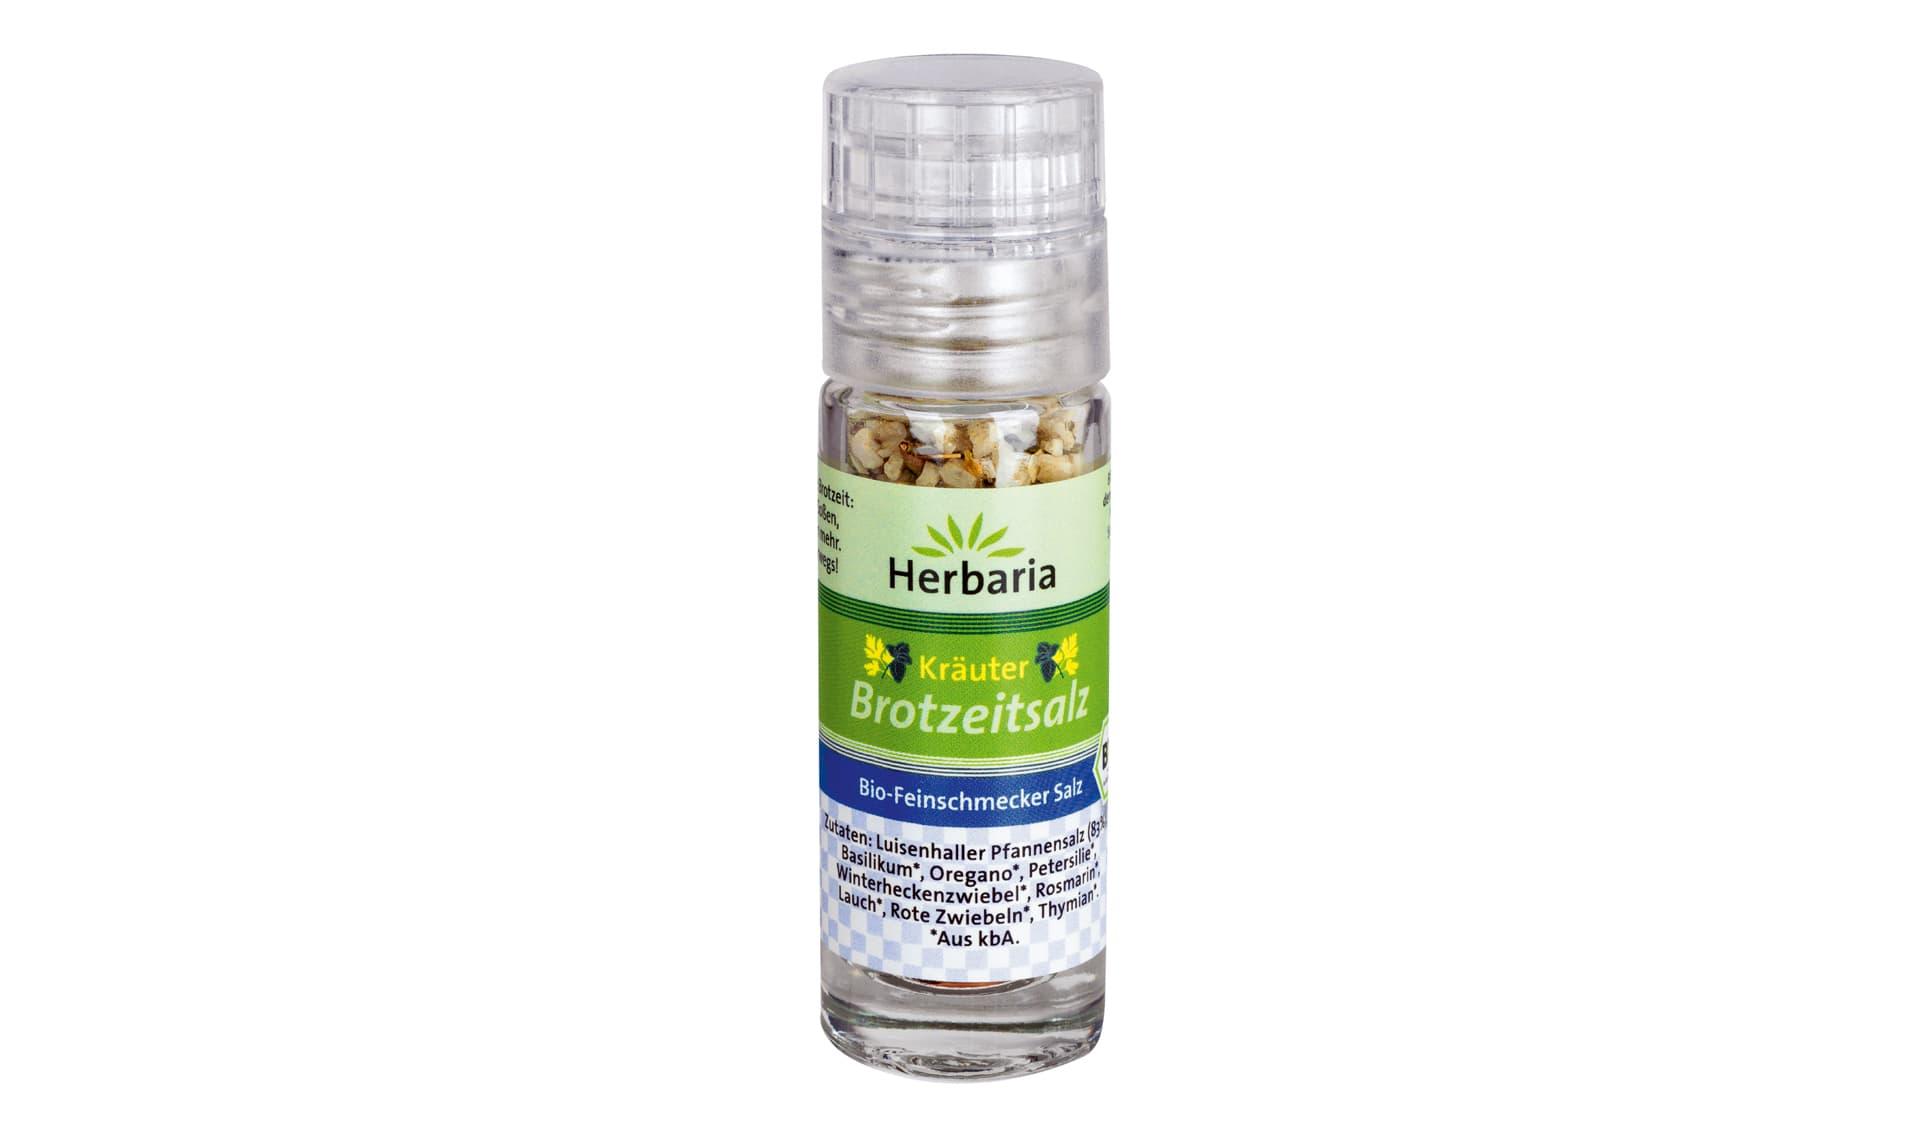 Herbaria Kräuter Brotzeitsalz (www.herbaria.de)